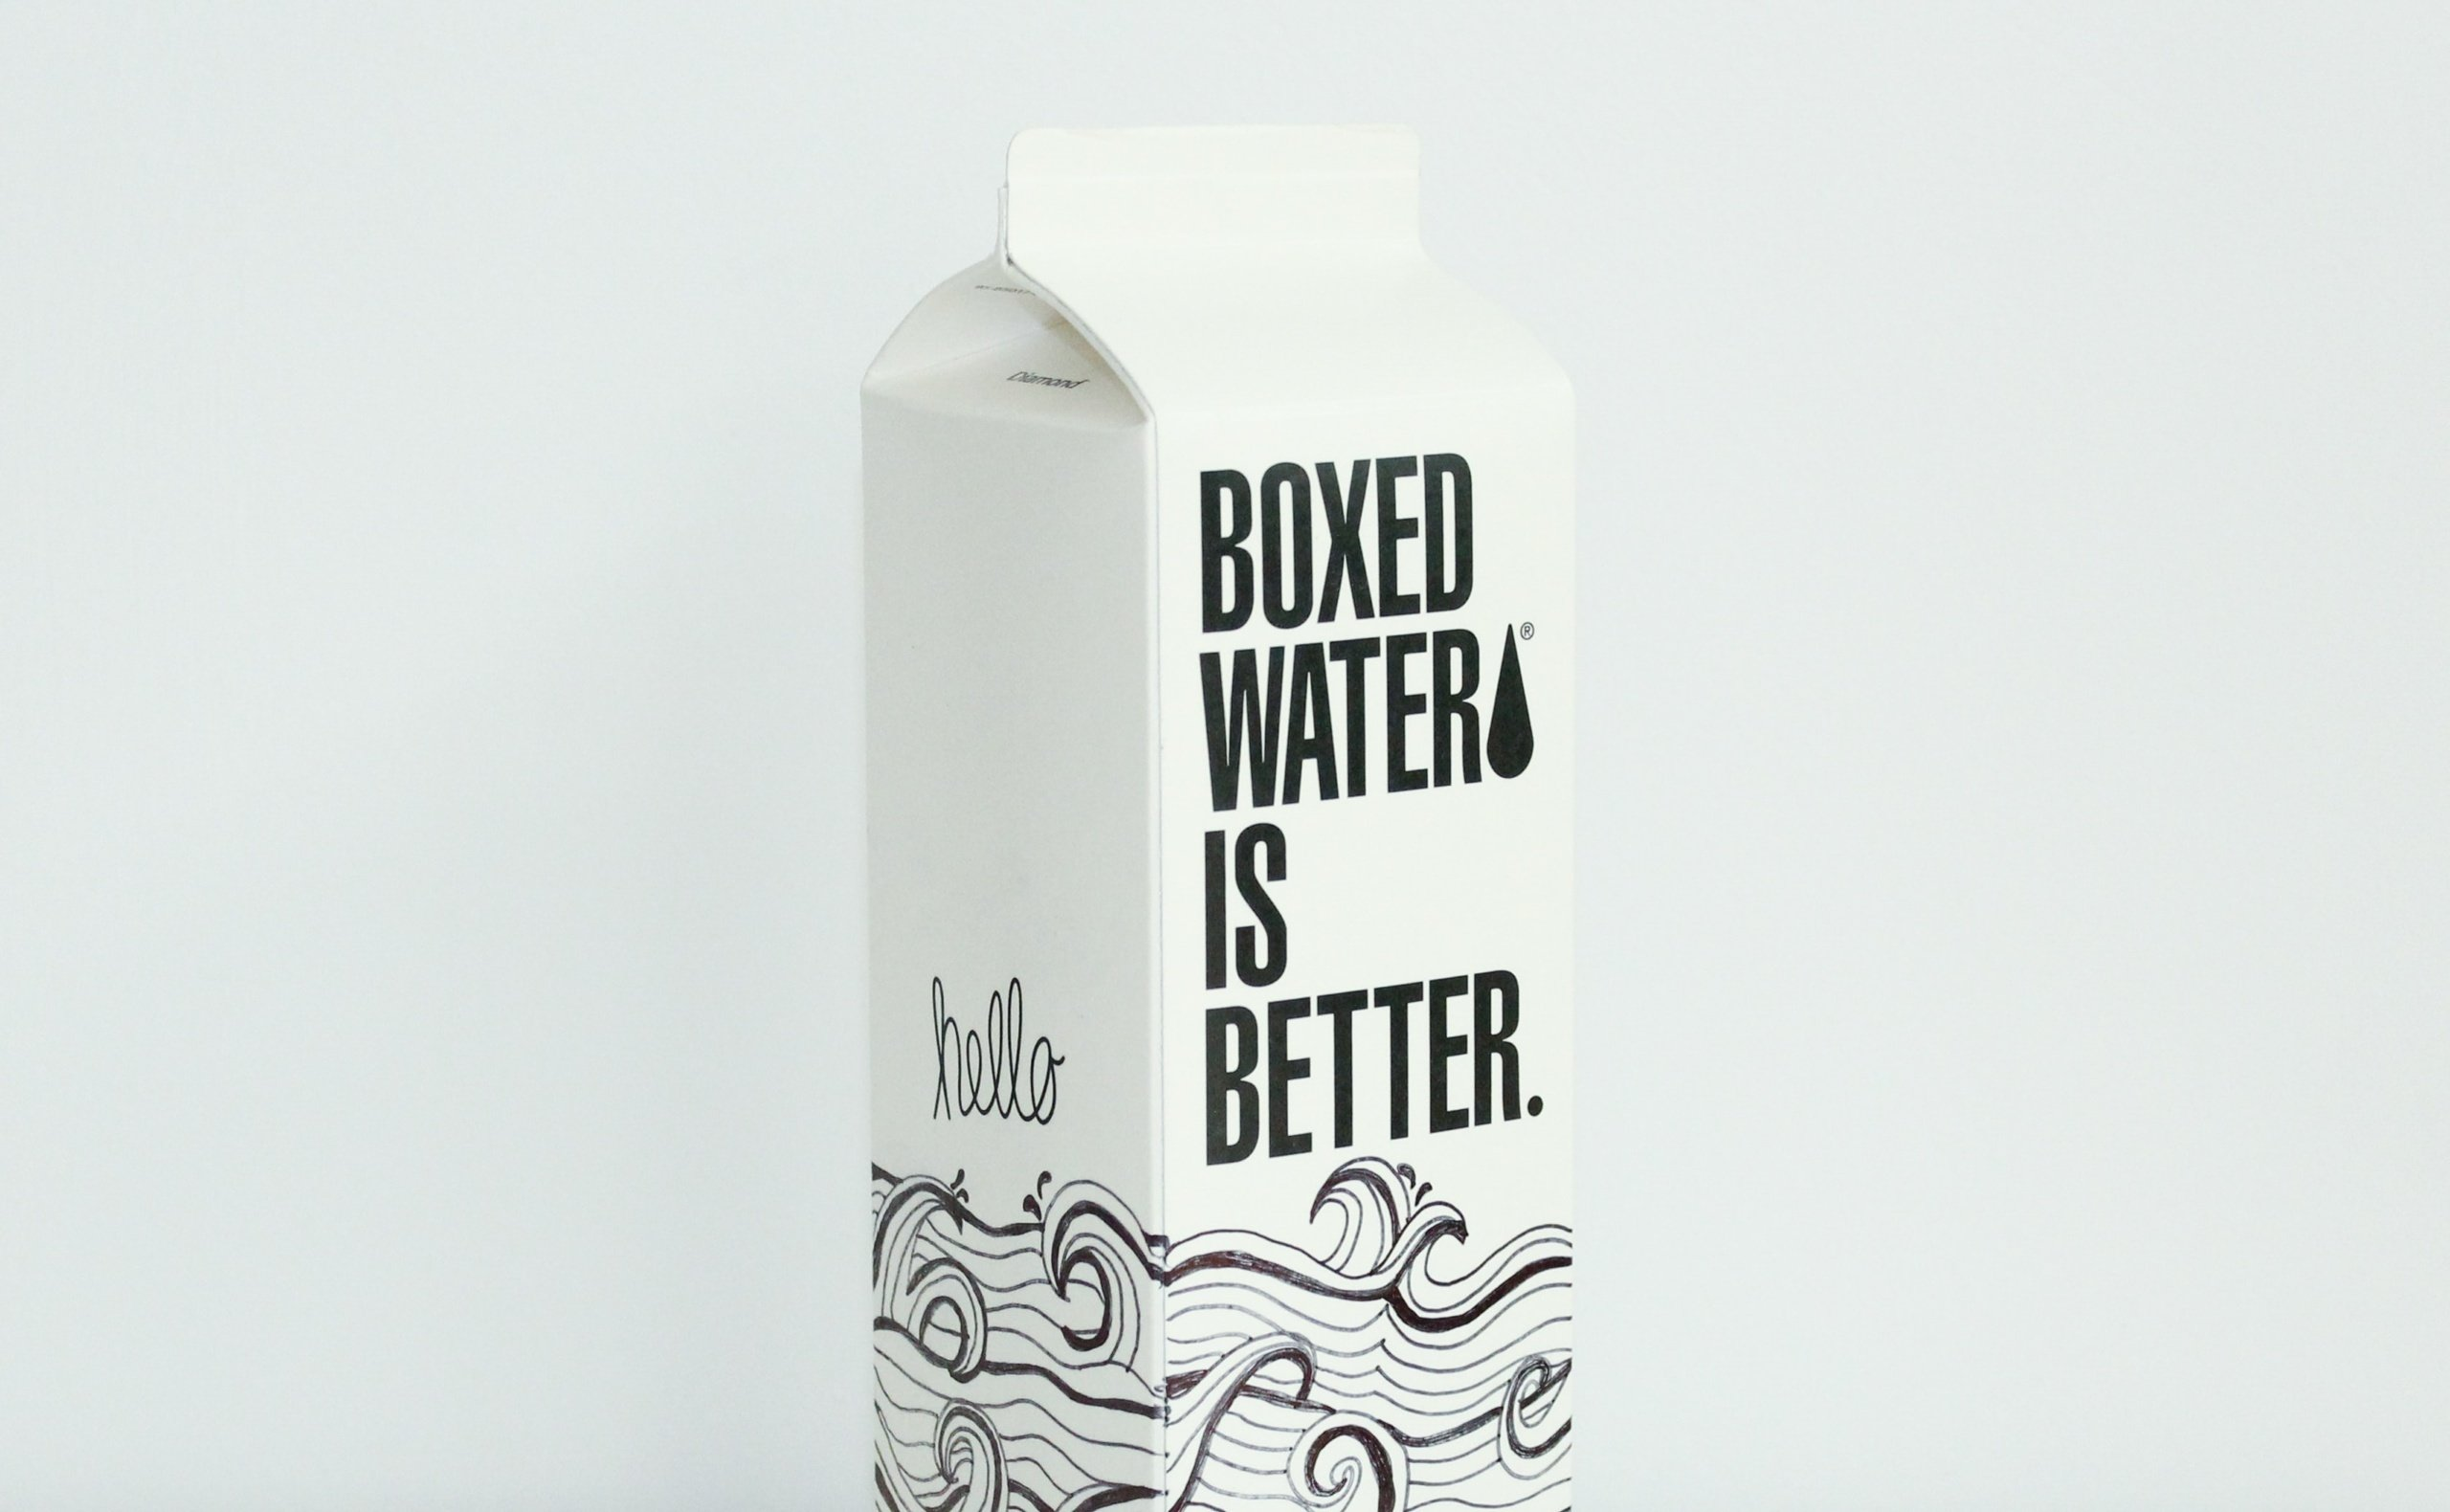 packaging efficace